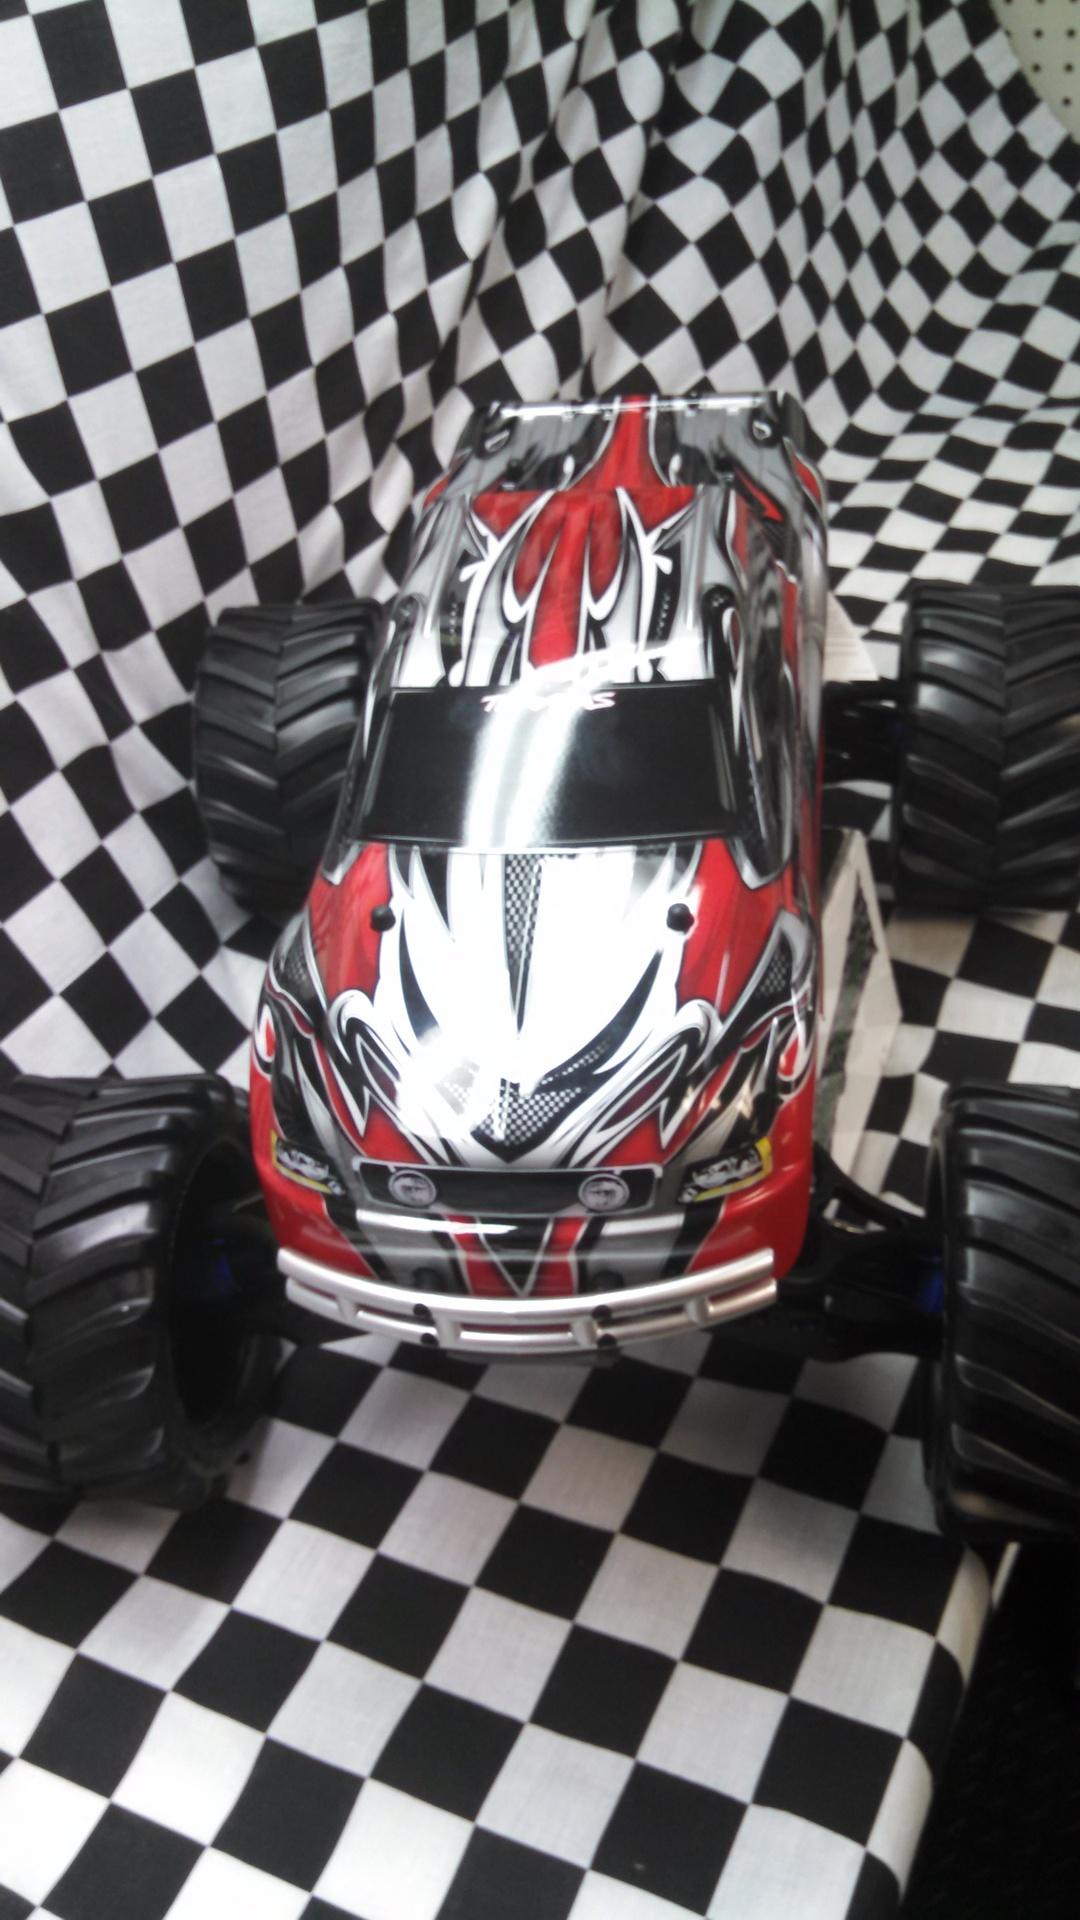 Traxxas 4WD Brushed E-Maxx